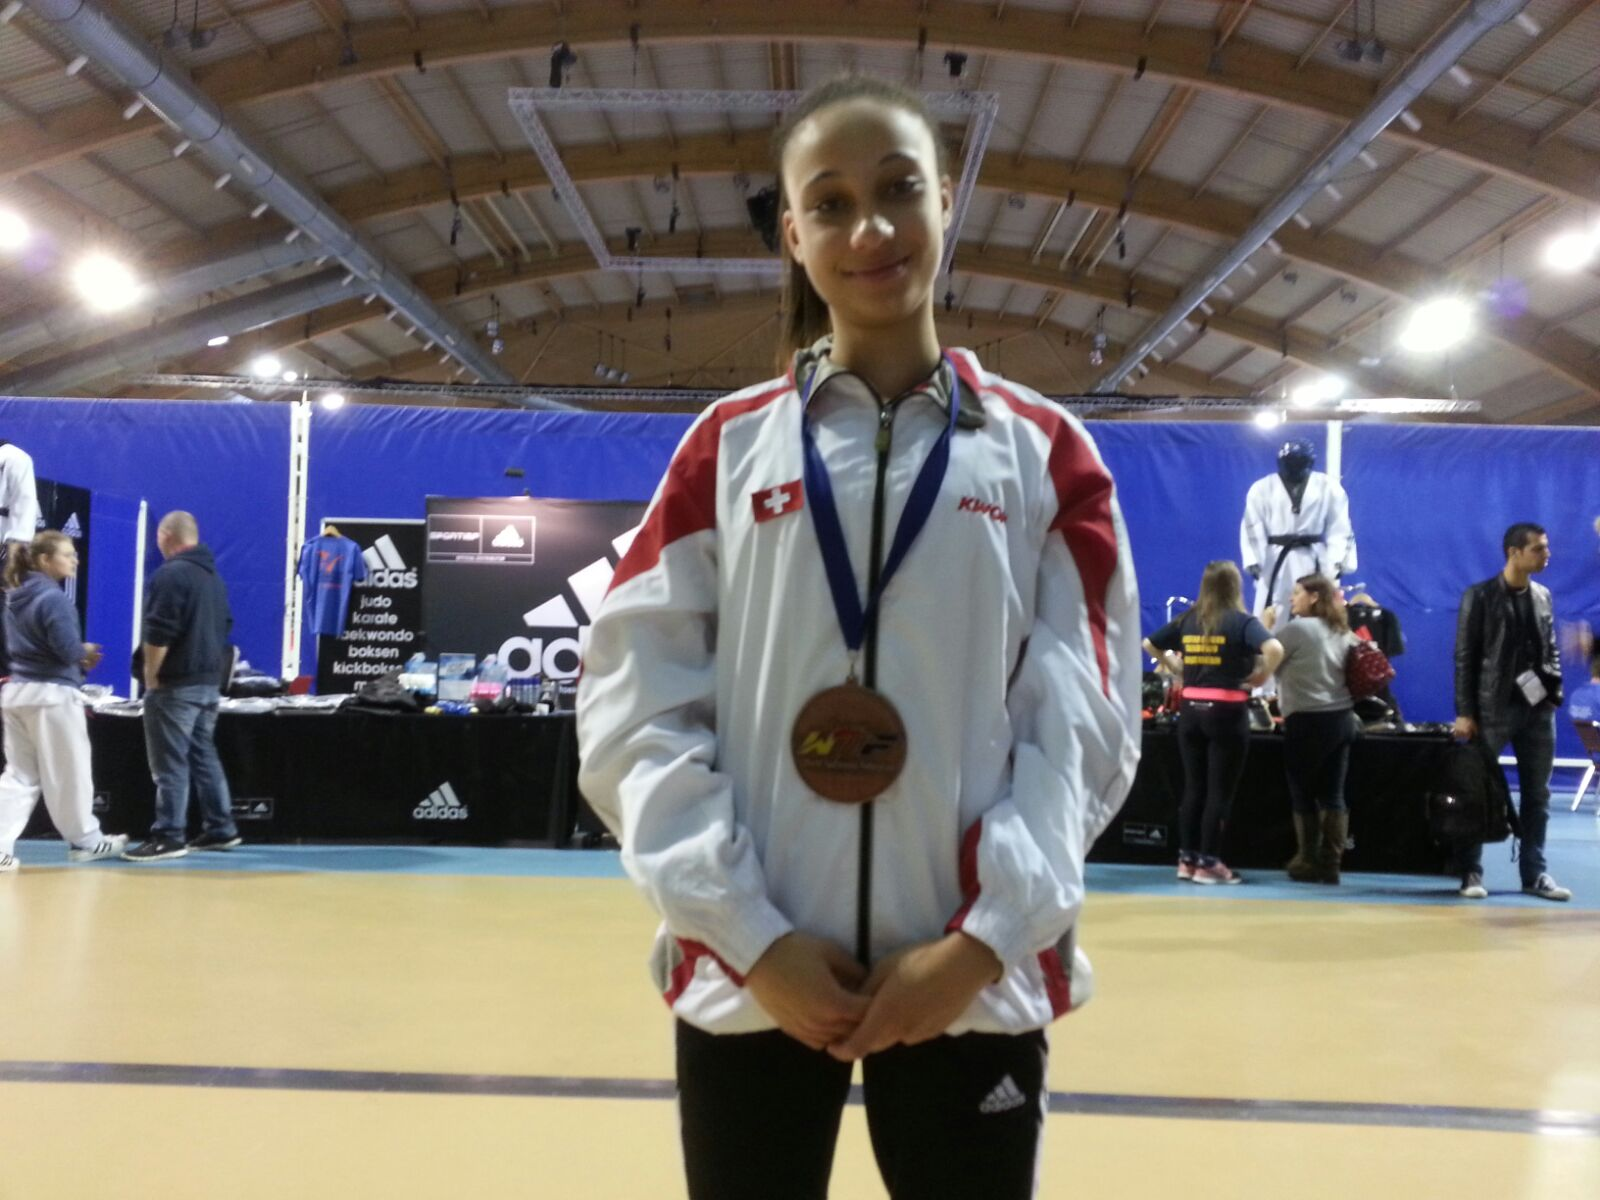 (K) Dutch Open 2016 WT G1: 1 Bronze Medal